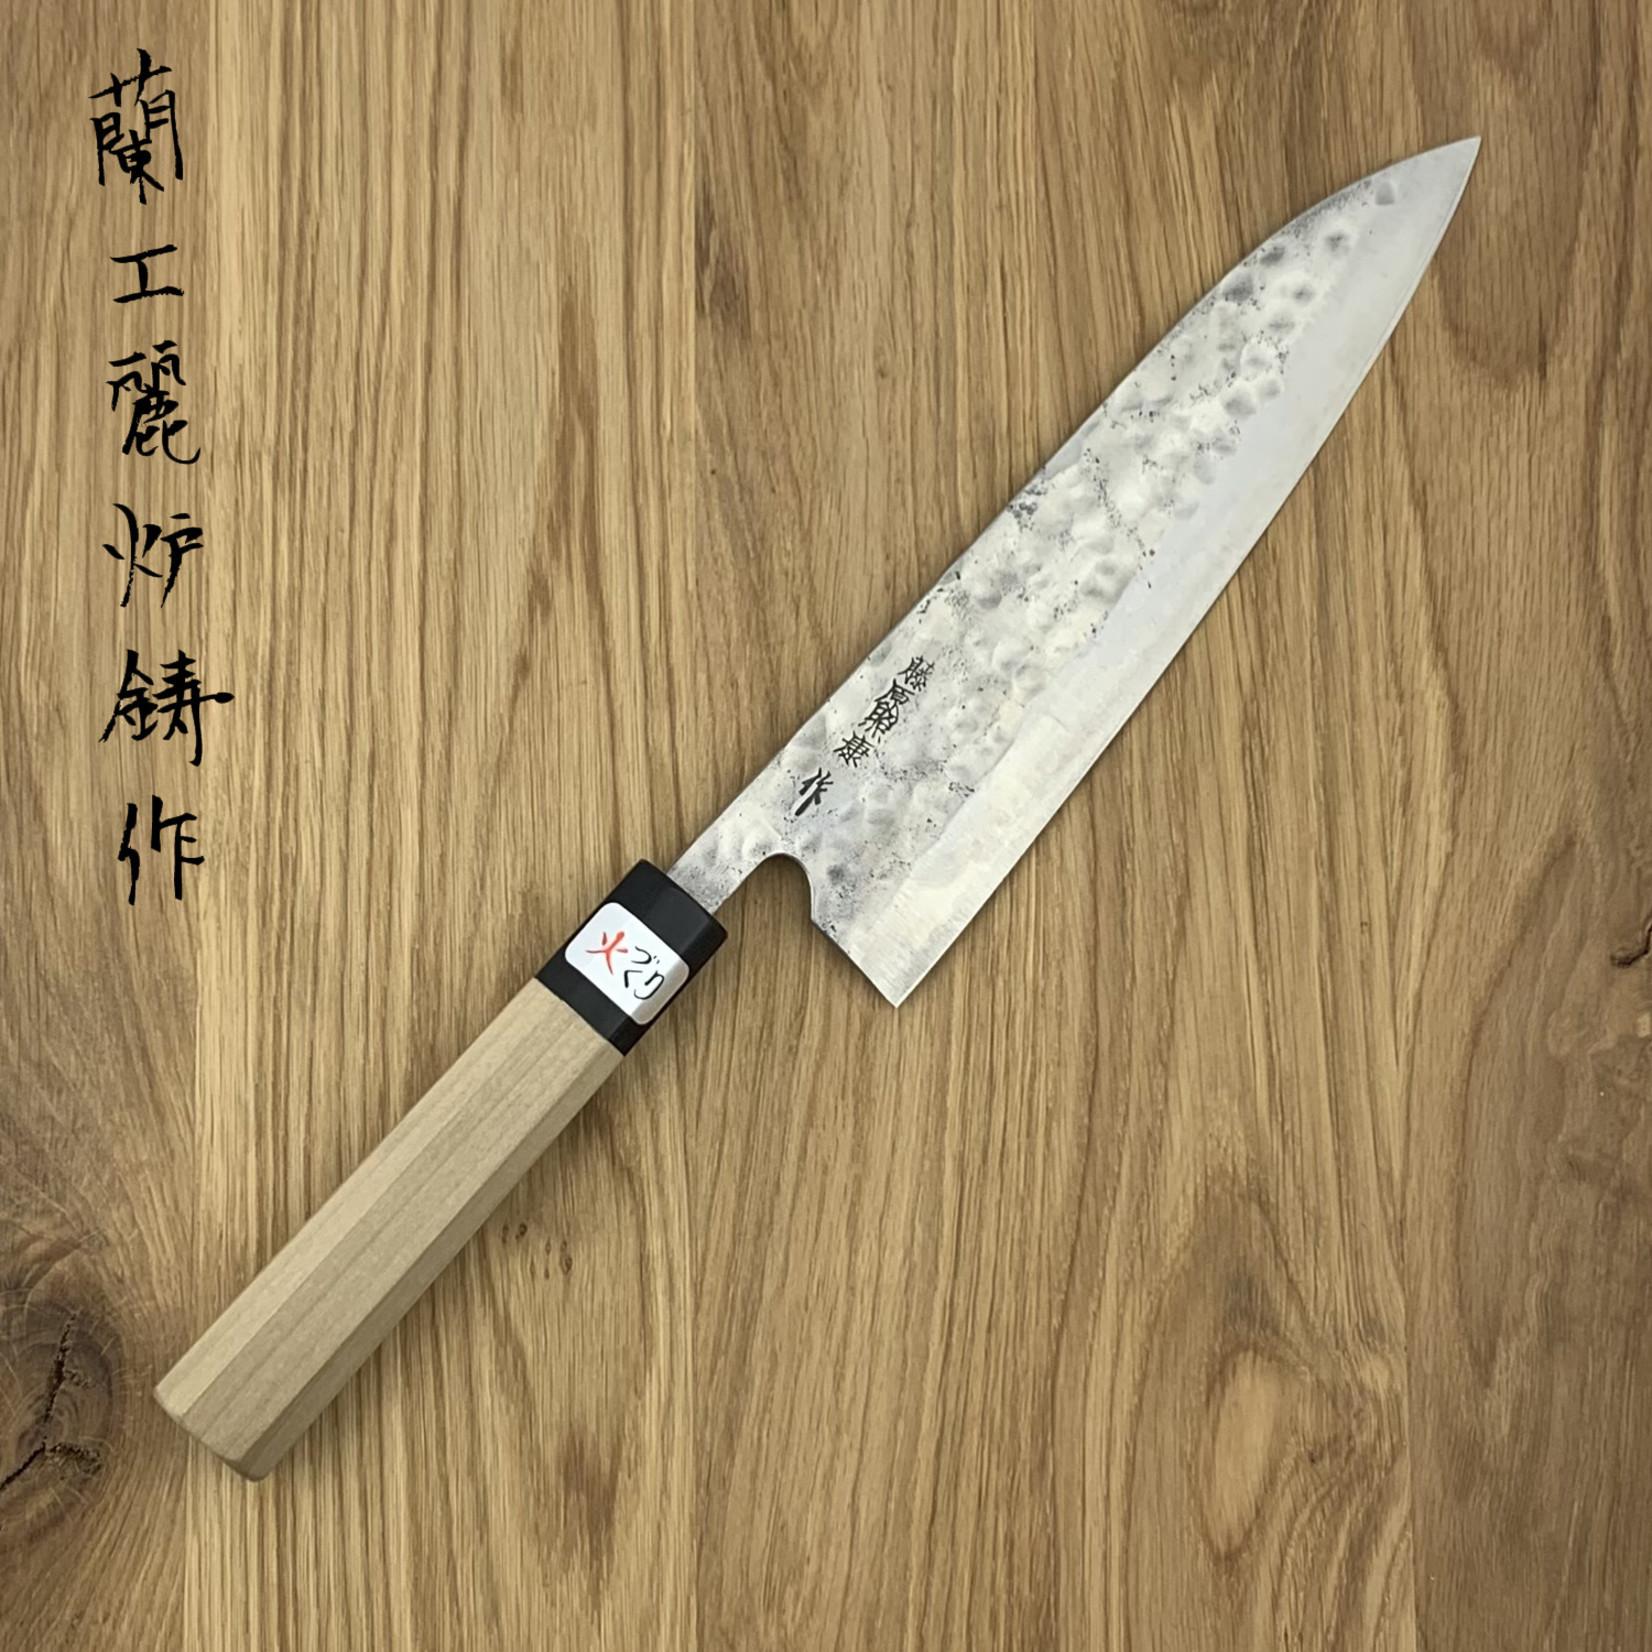 FUJIWARA Maboroshi Gyuto 195 mm Magnolia WA handle